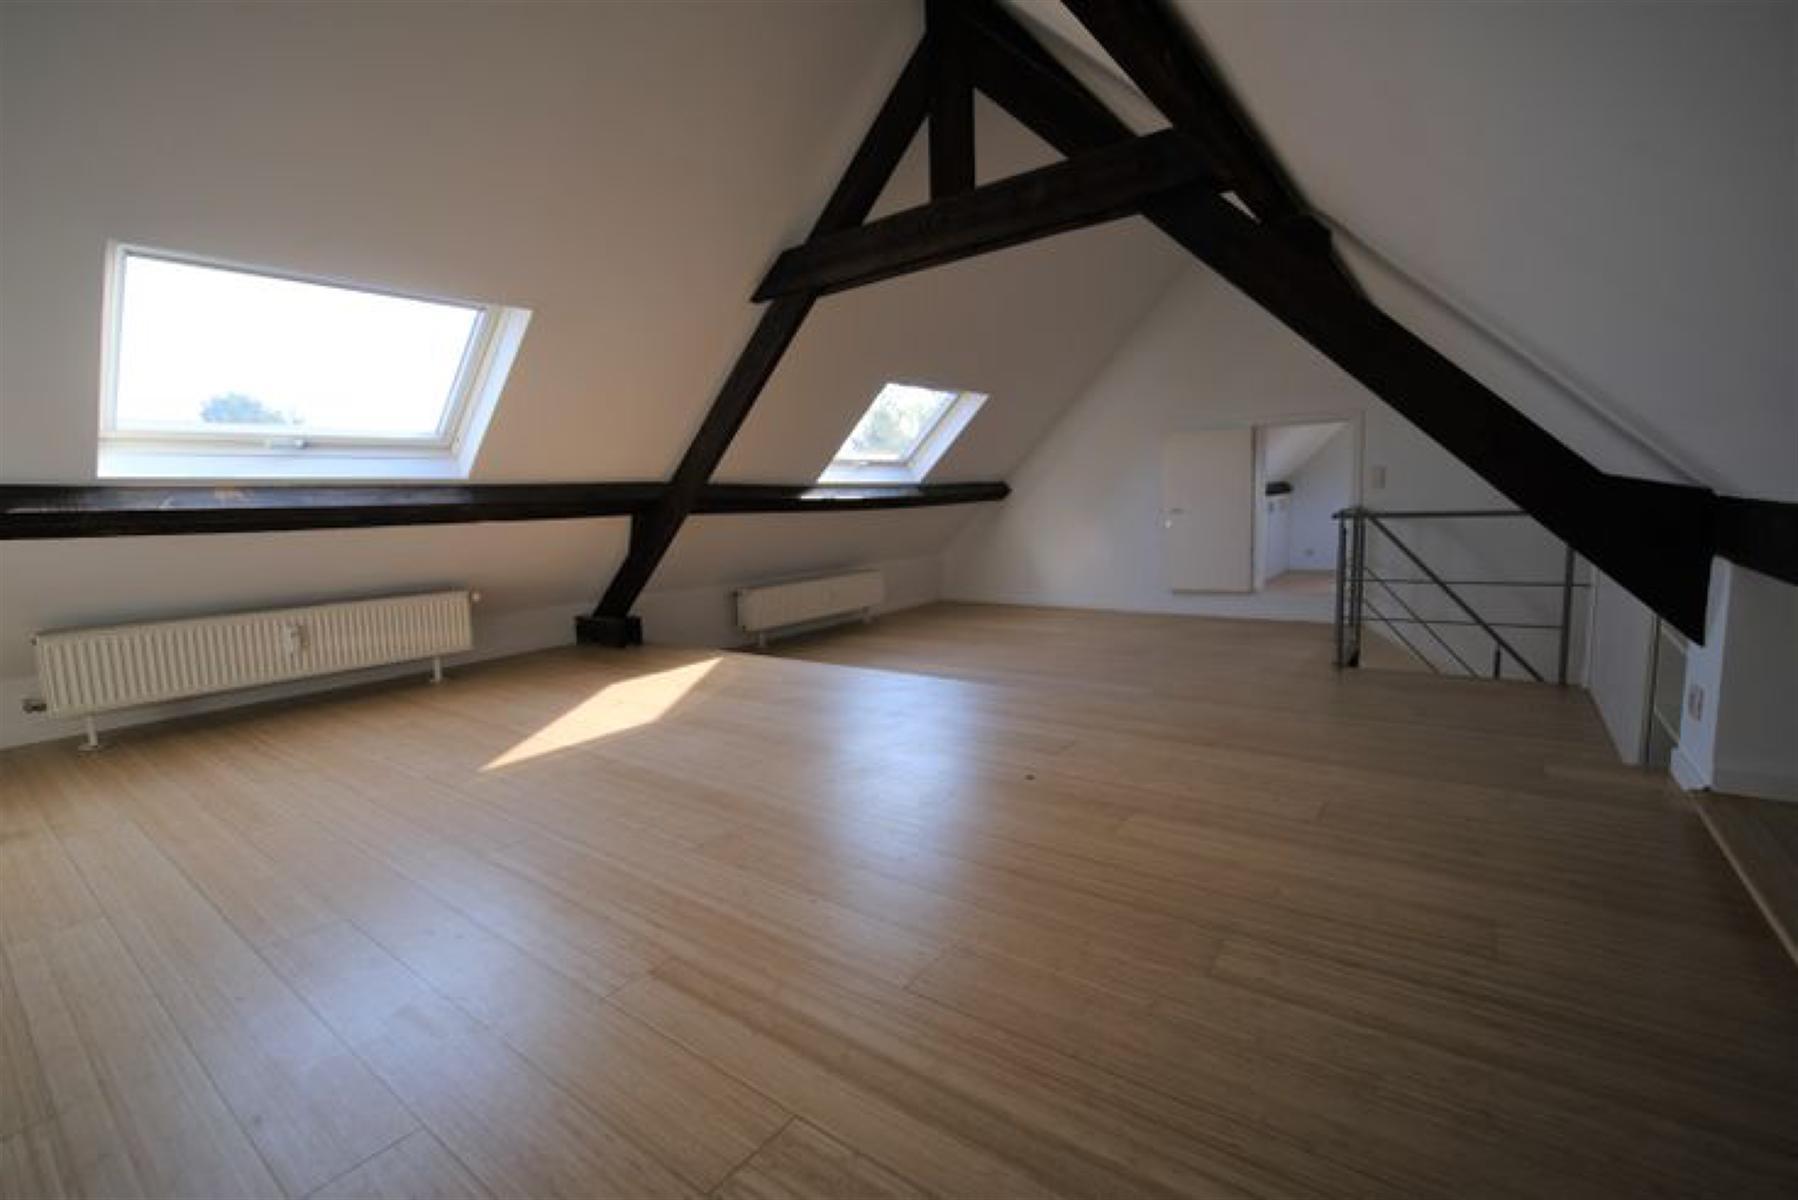 Flat - Auderghem - #4520709-10